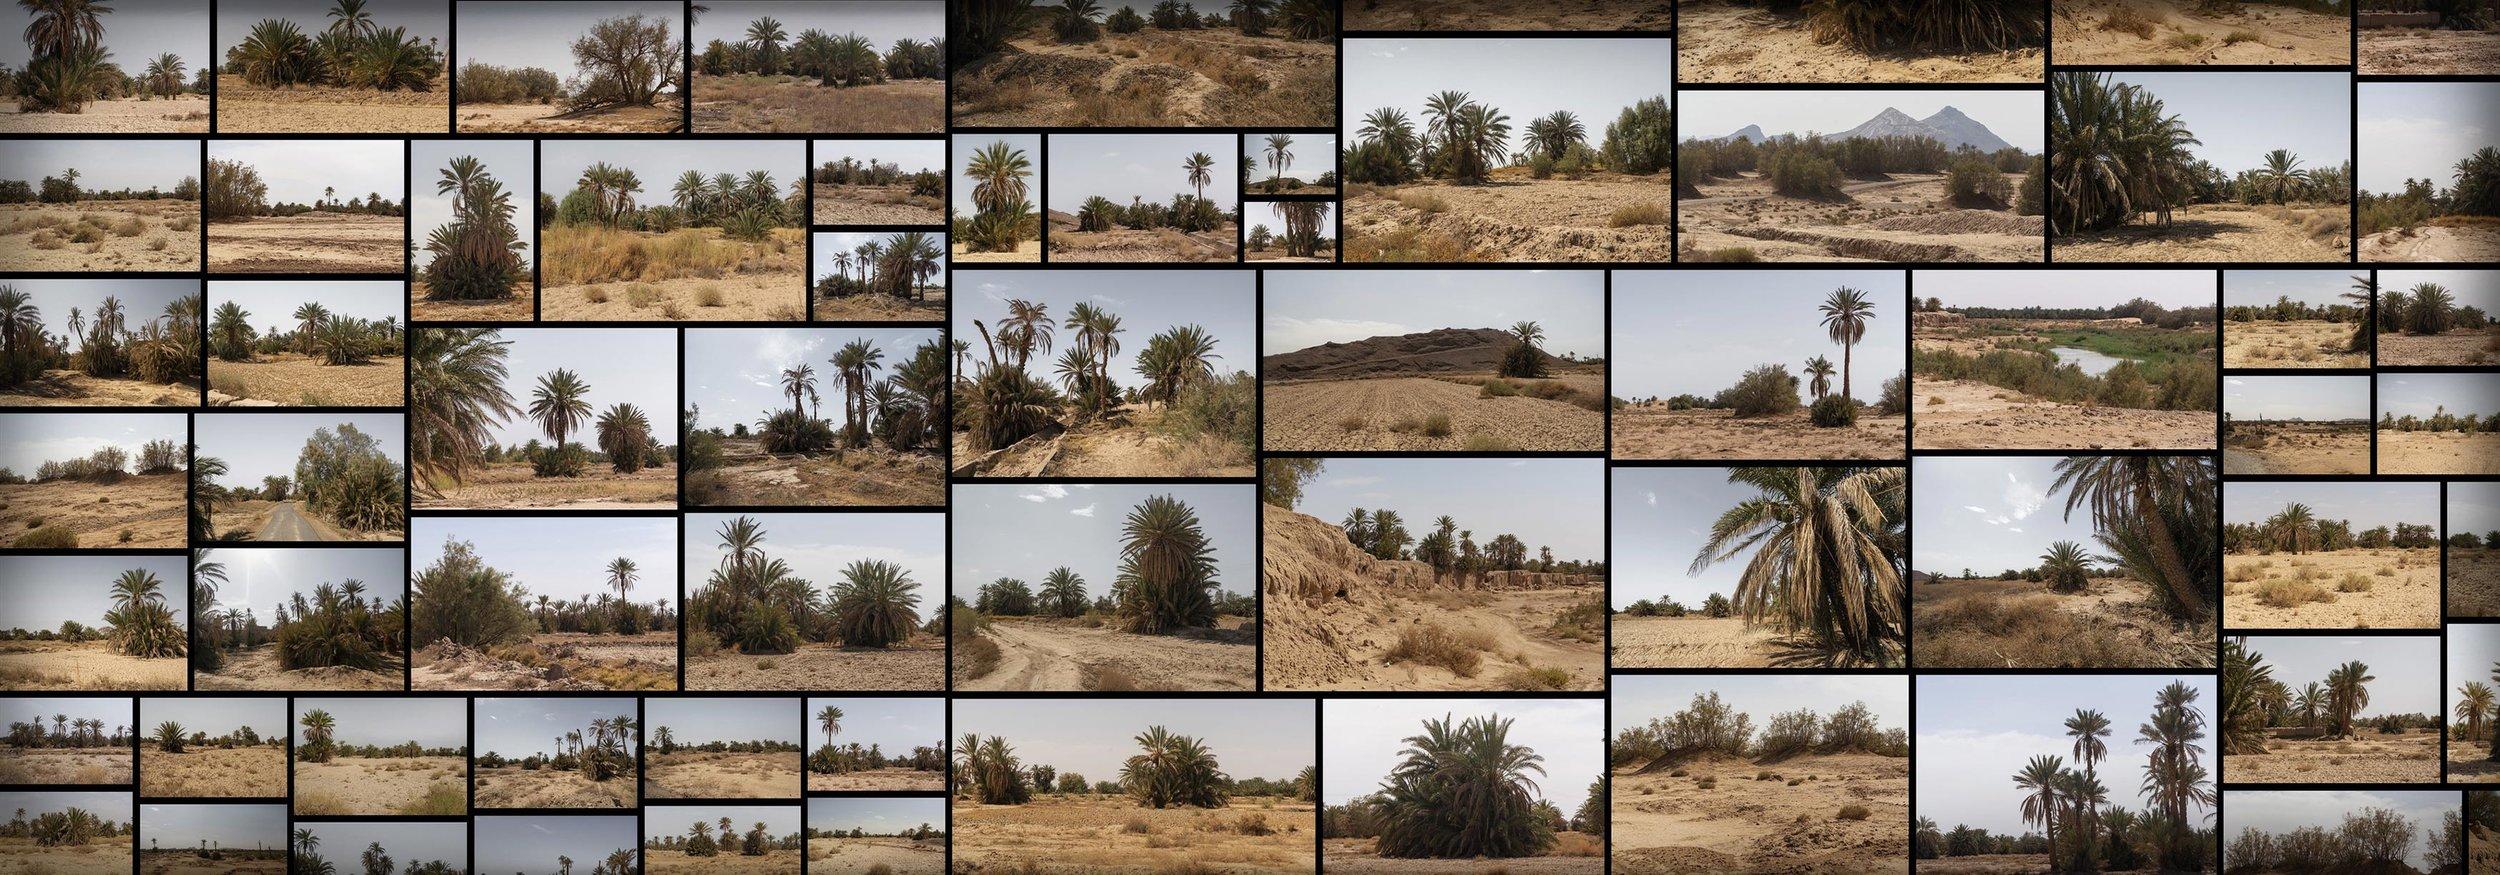 Desert Palm Grove Morocco Merzouga Oasis